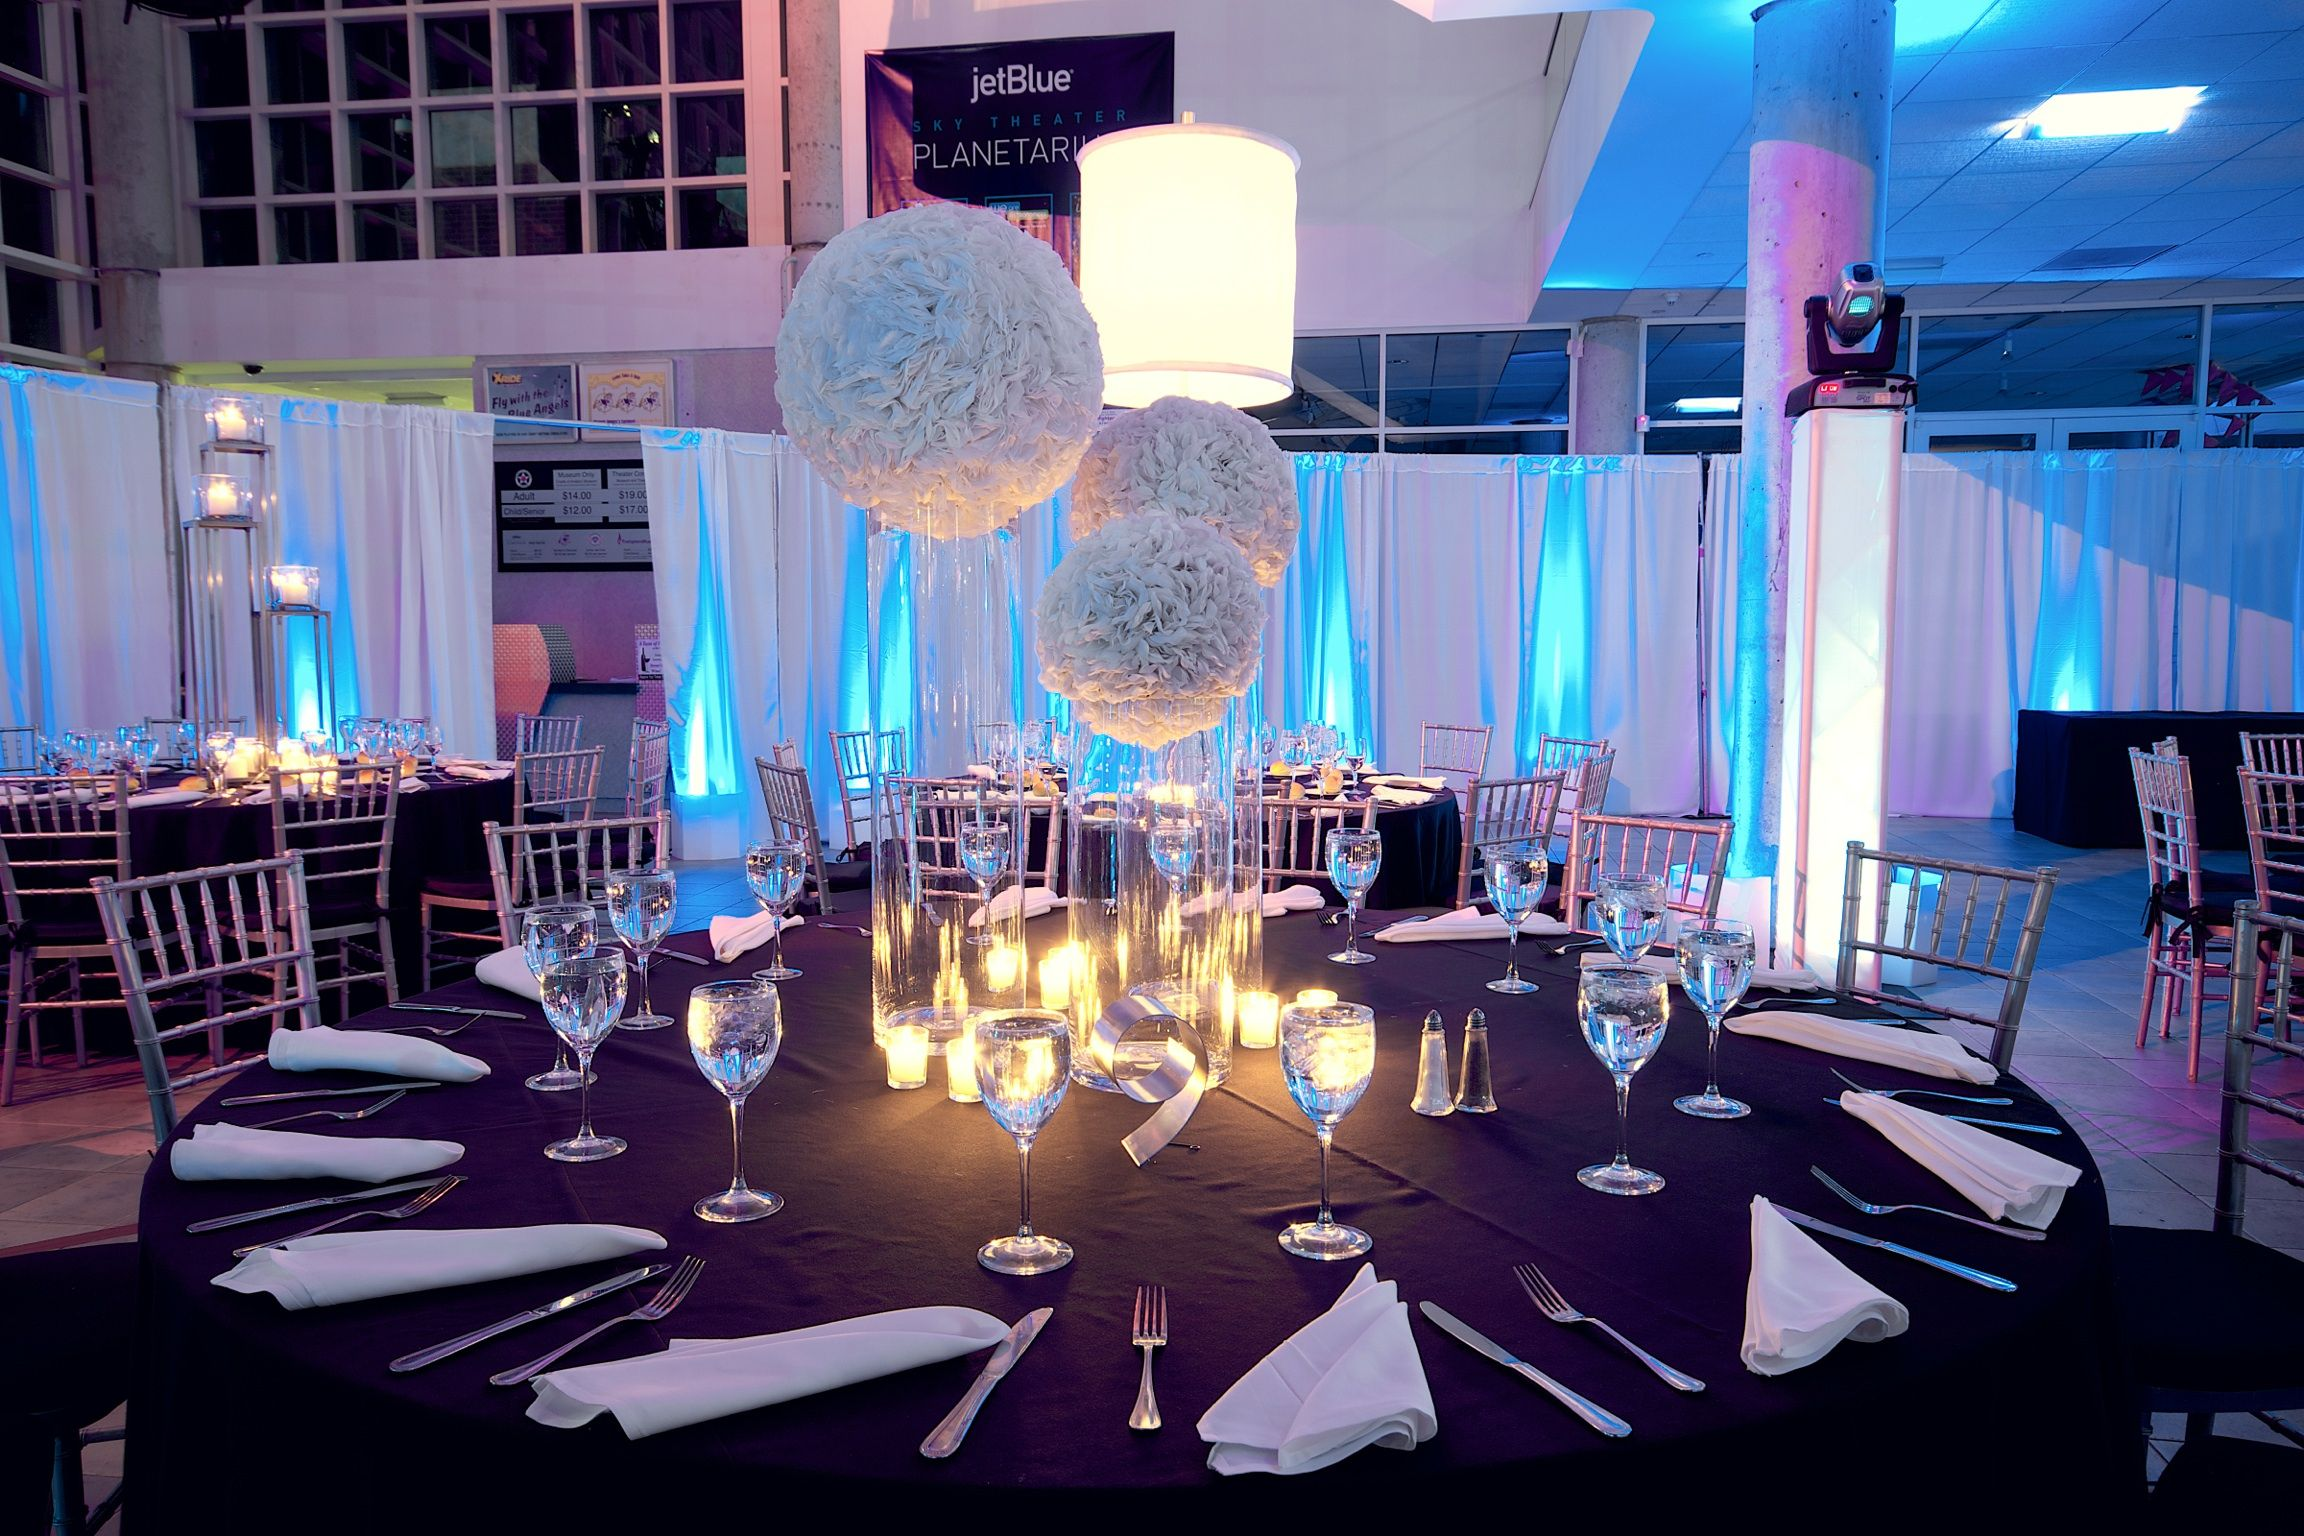 Wedding decoration ideas for hall  Modern room decor  Bar mitzvahs  Pinterest  Modern room decor